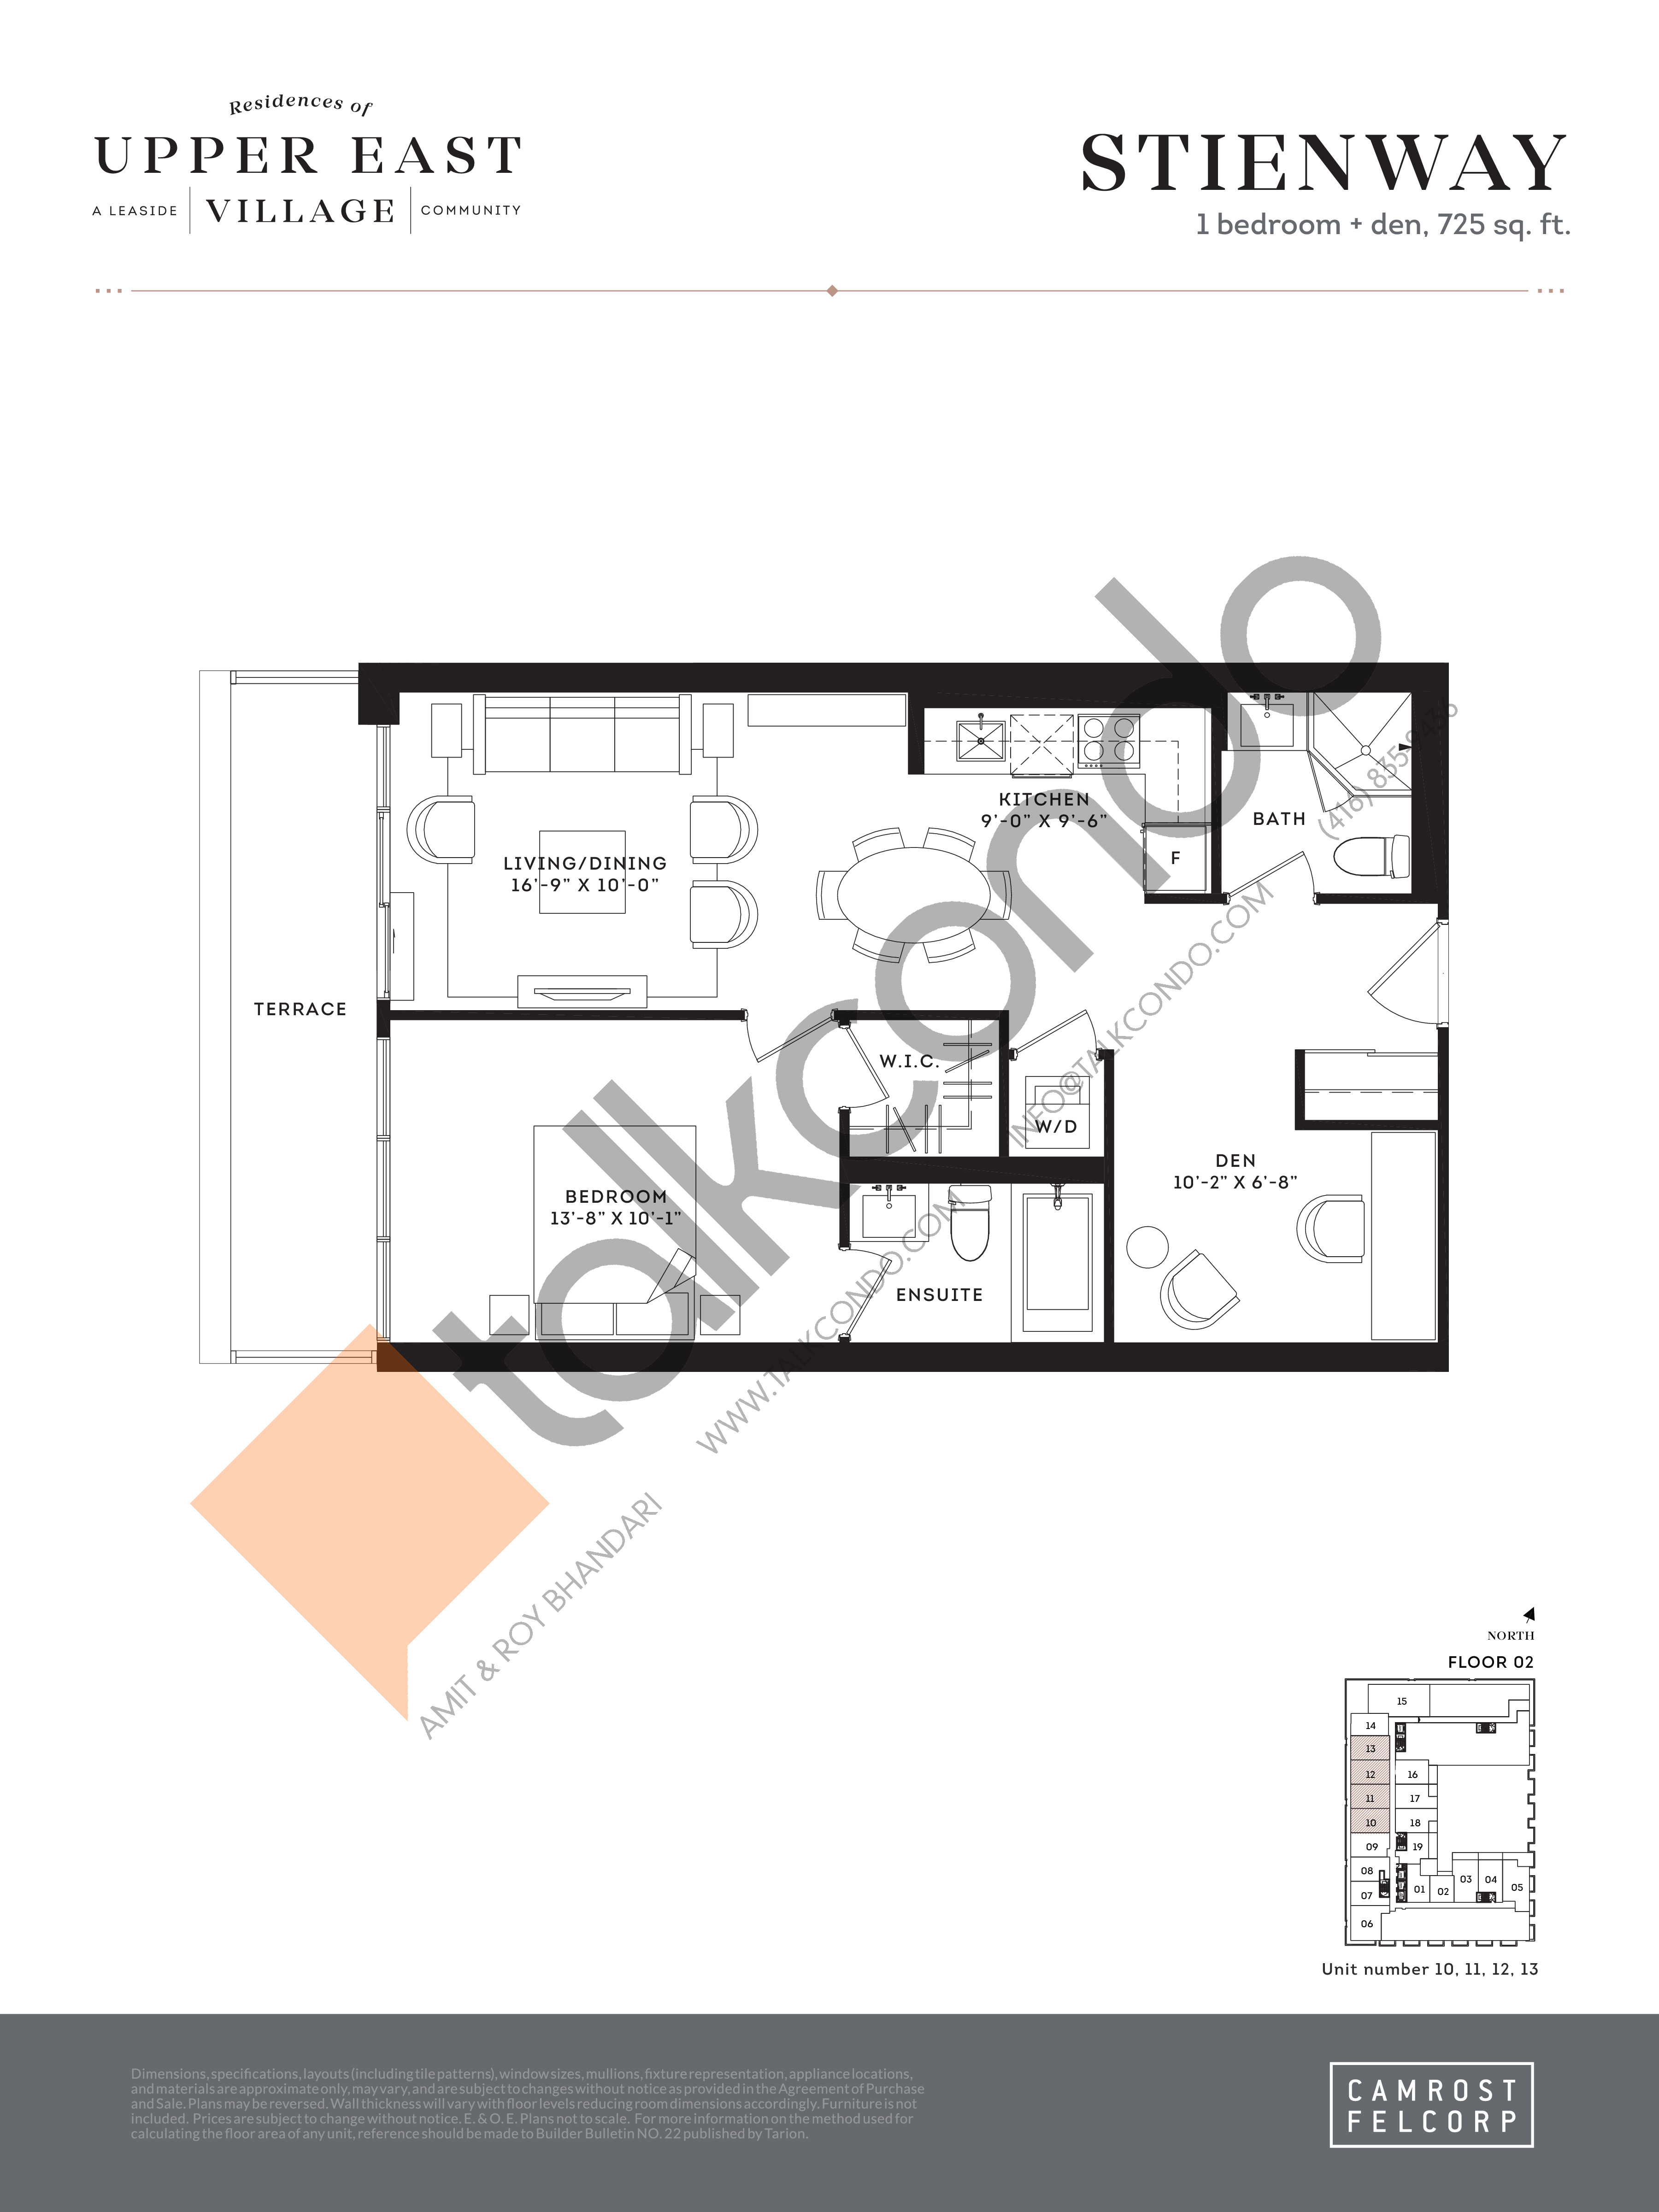 Stienway Floor Plan at Upper East Village Condos - 725 sq.ft